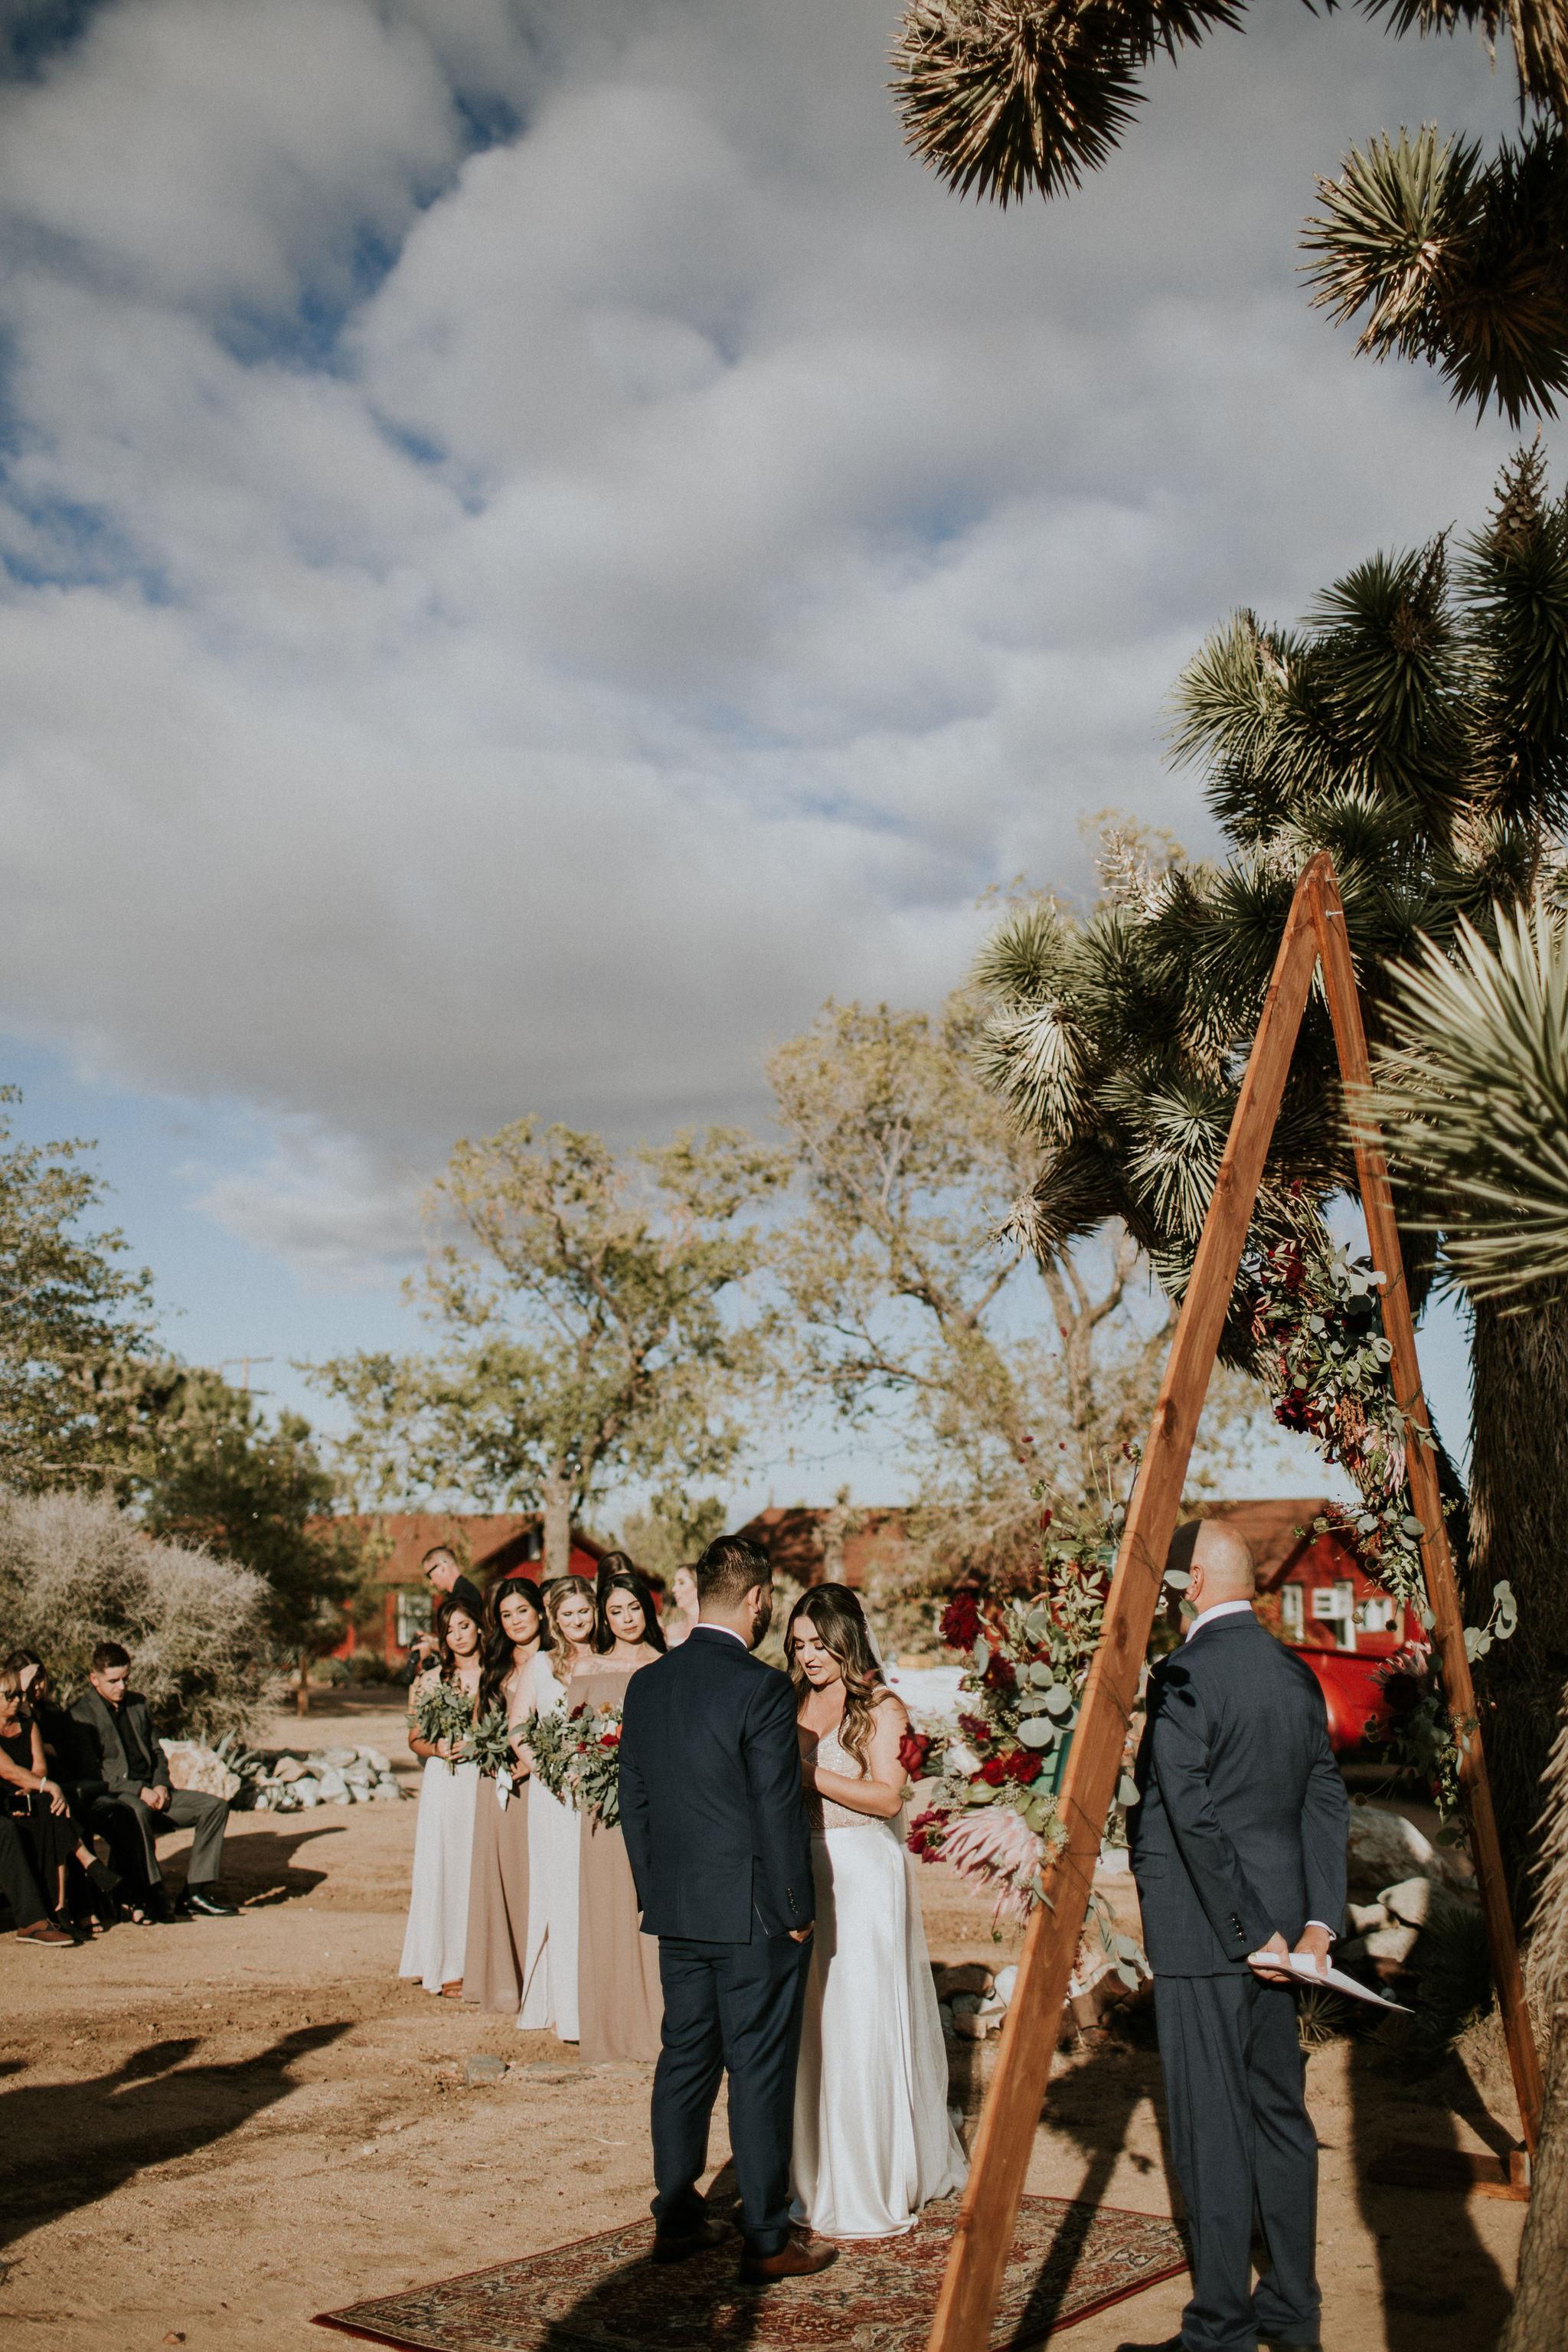 RimrockRanch-JoshuaTree-Wedding-Jami-Laree-358.jpg